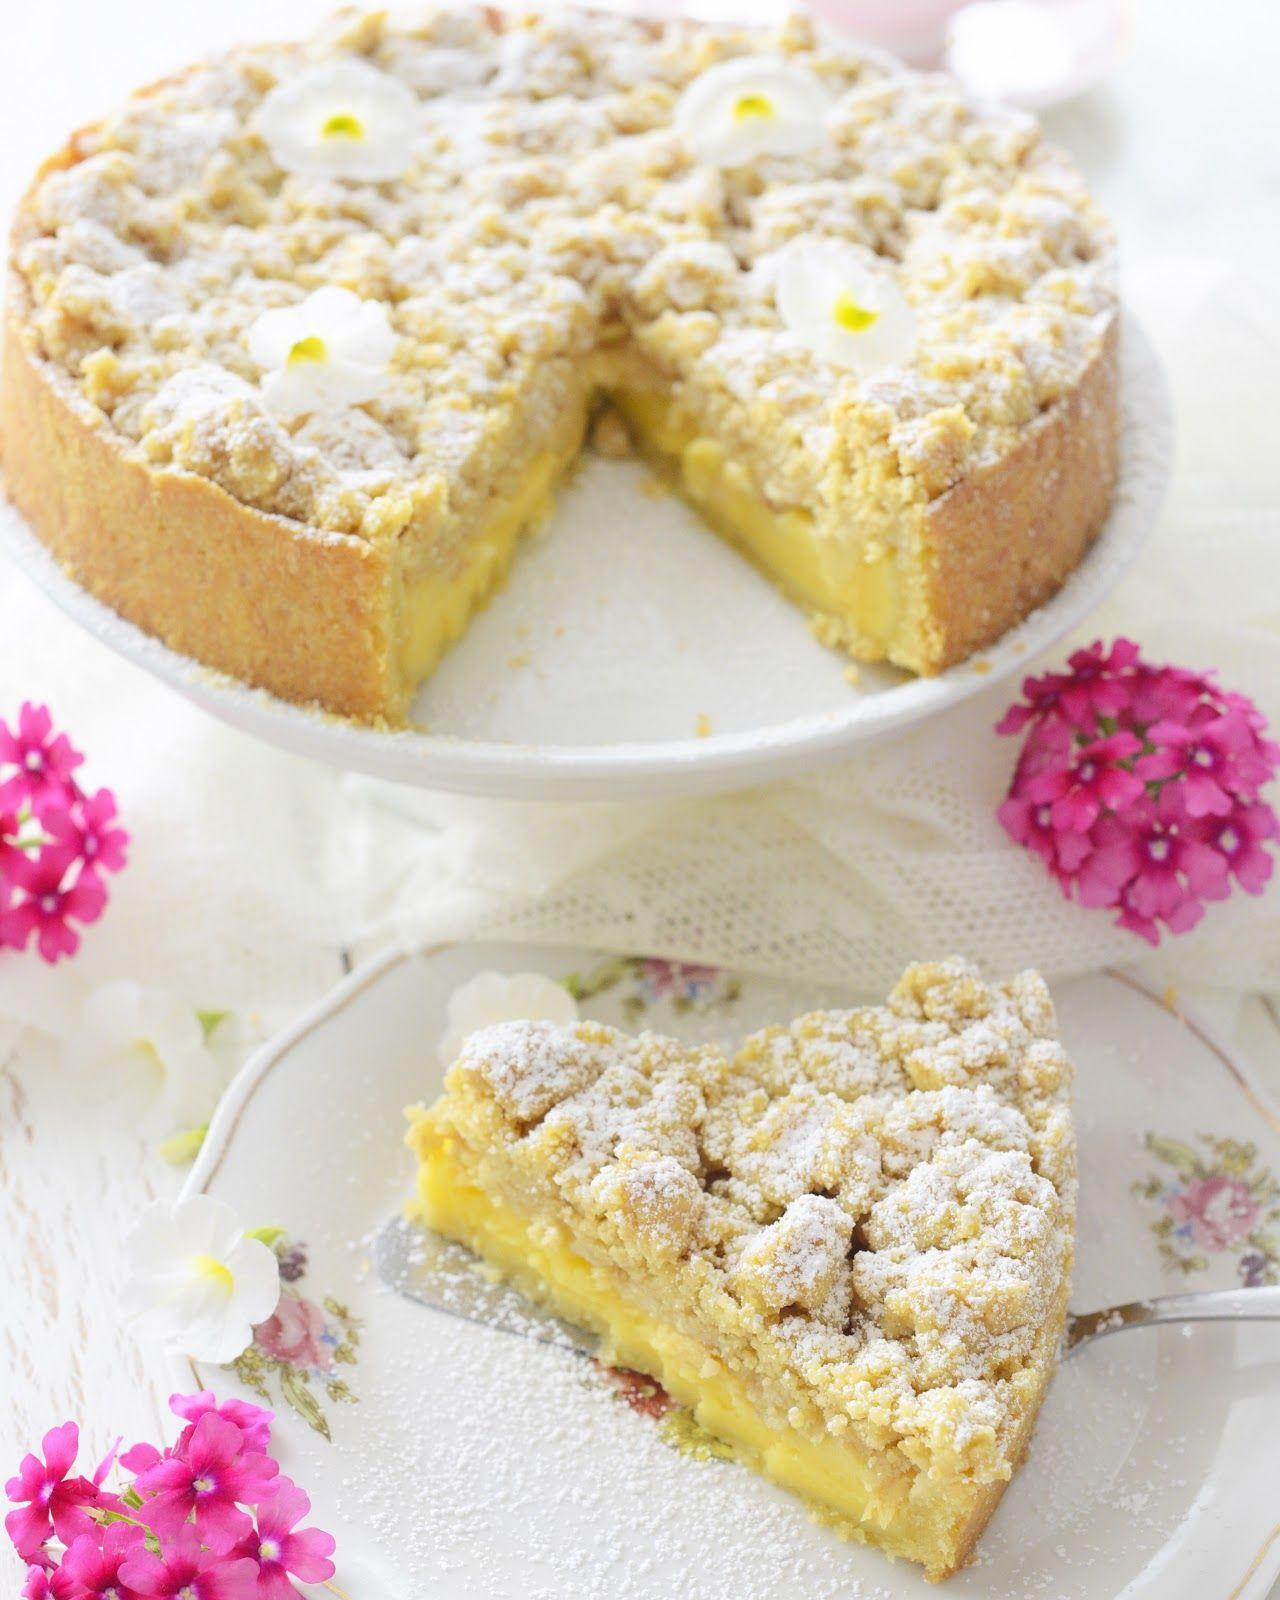 Kessy's Pink Sugar: Apfel Streuselkuchen mit Vanillepudding - Klassiker Kinderkuchen #applechips